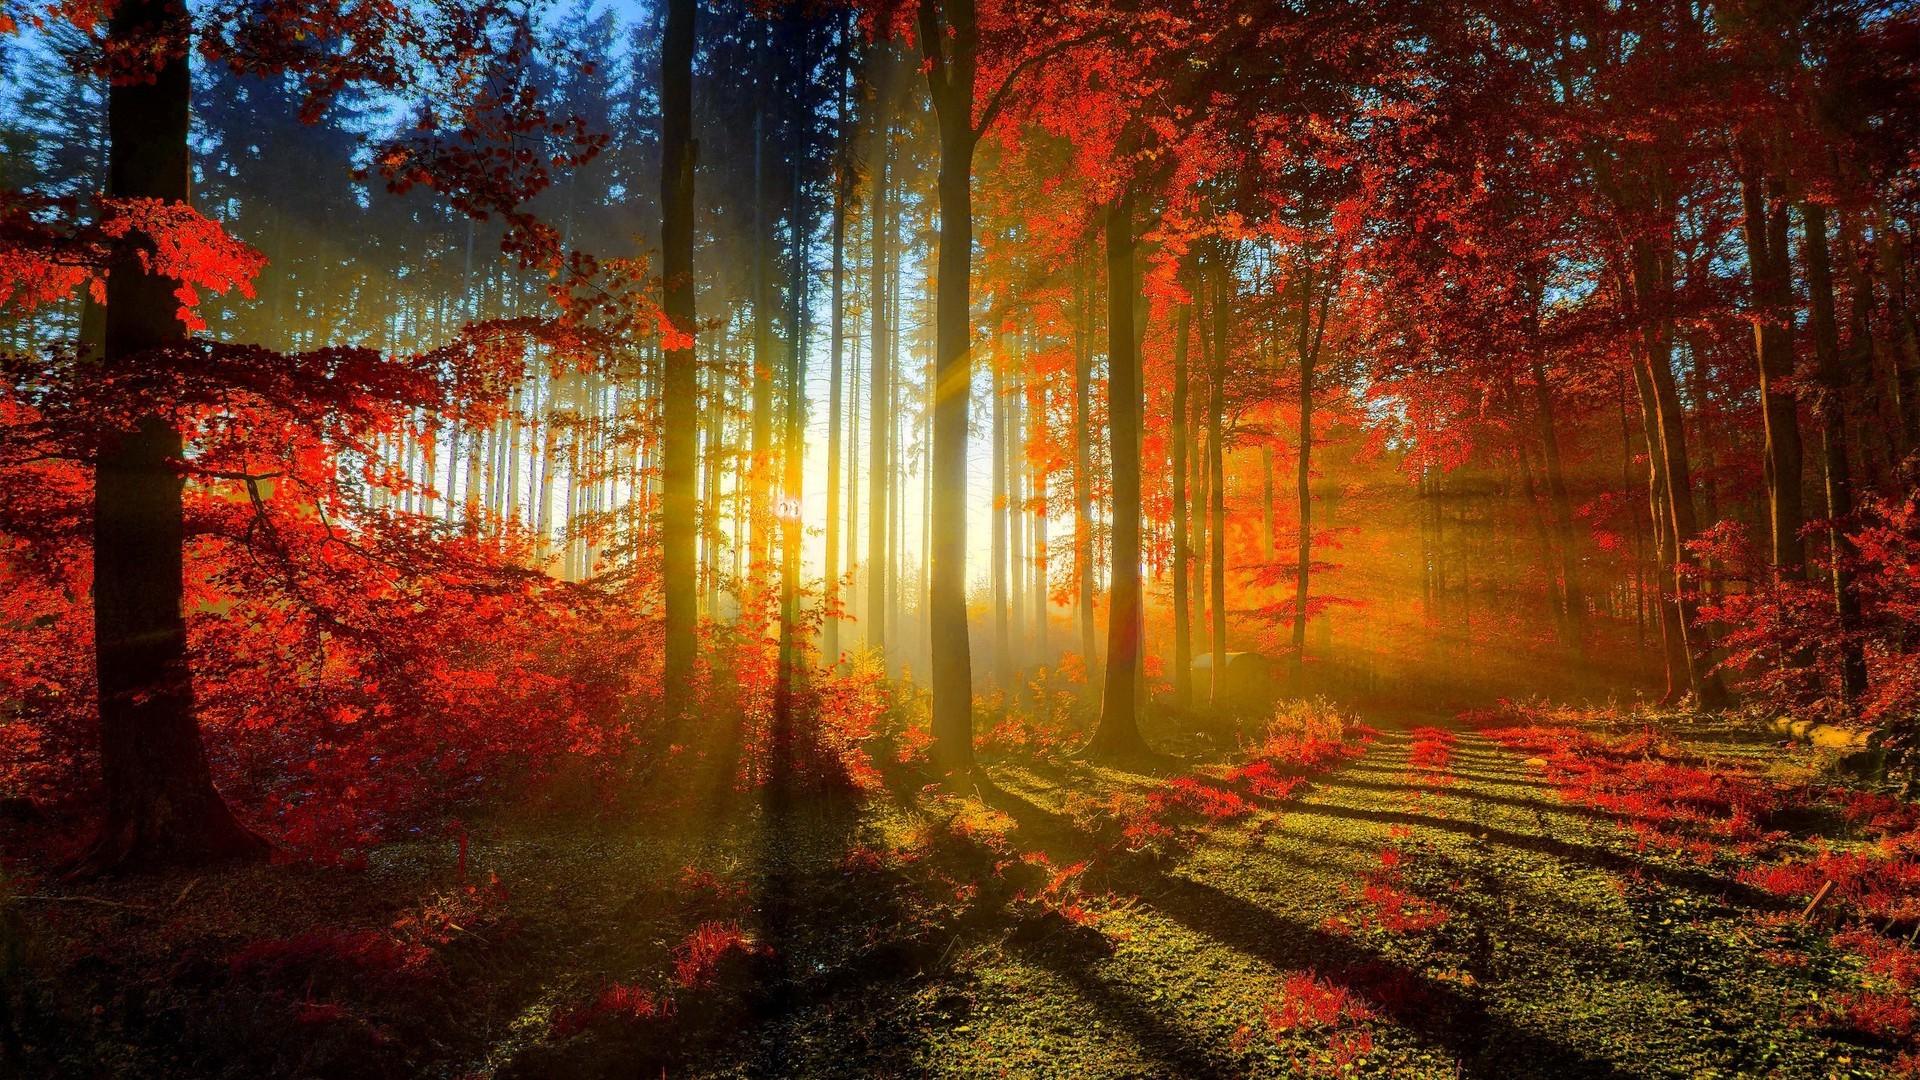 Beautiful Nature Hd Wallpapers Free Download #15862 Wallpaper ...